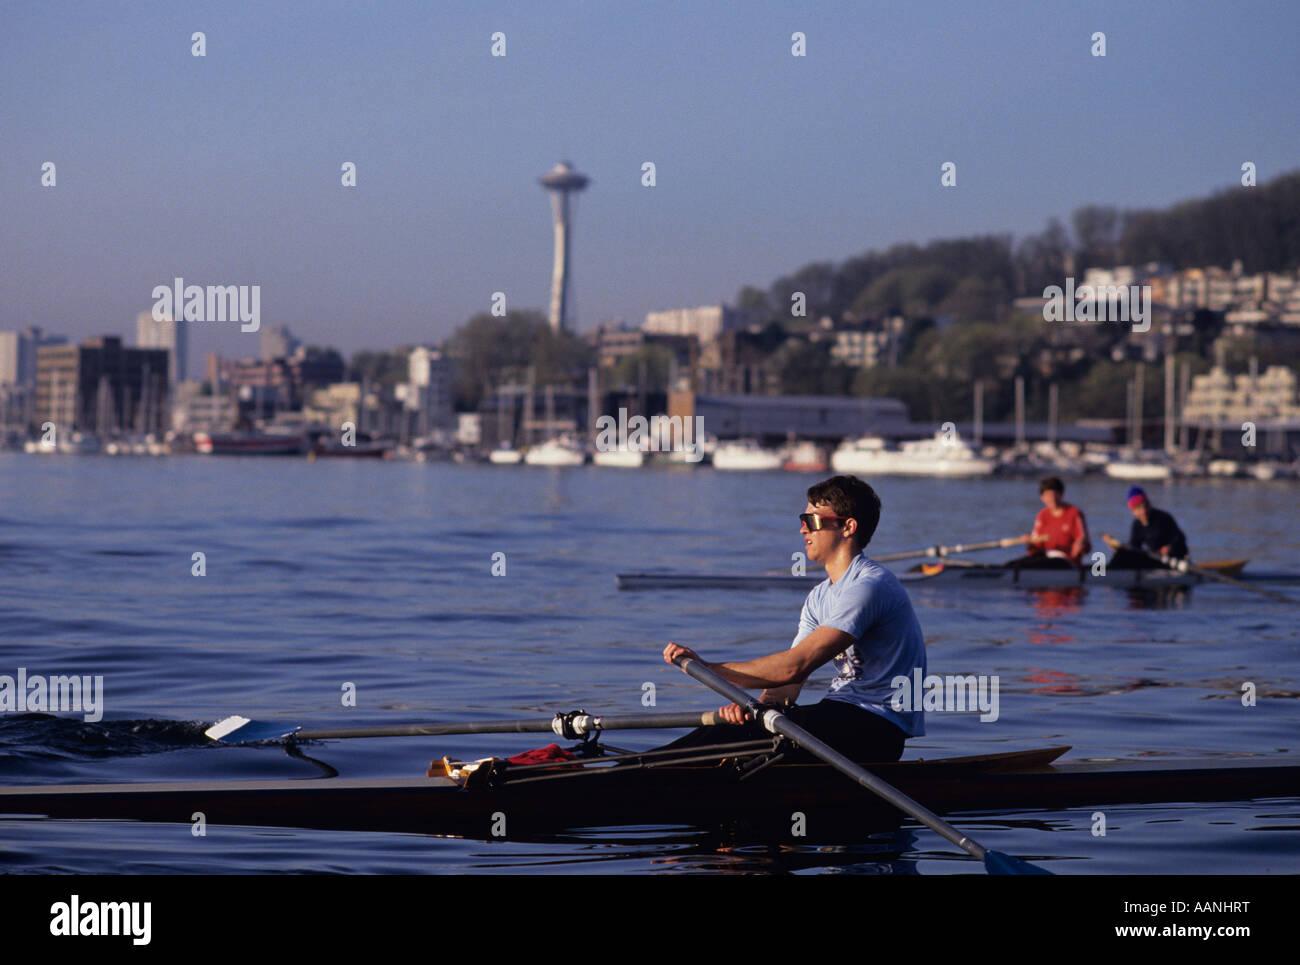 Single and two man shell with men rowing on Lake Union at sunrise, Seattle, Washington State - Stock Image